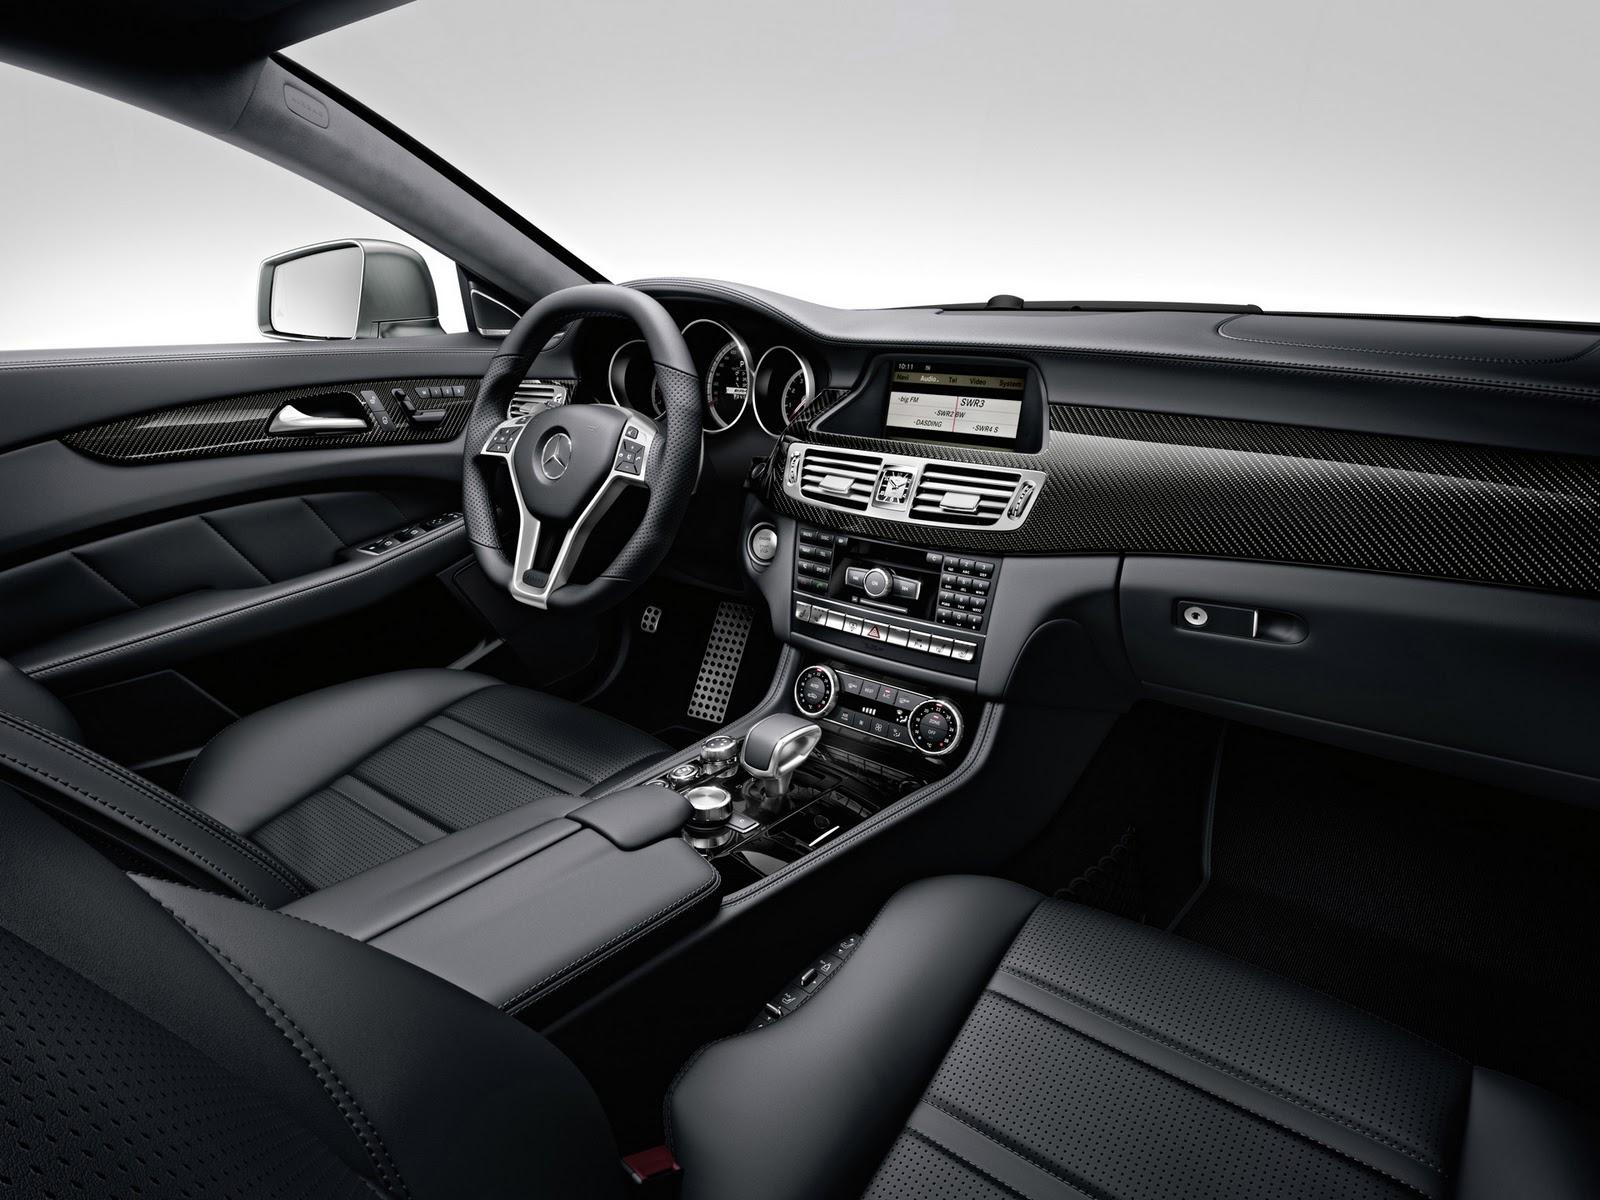 http://3.bp.blogspot.com/_viCh1SFyGrA/TO1up5ZZPrI/AAAAAAAAAJU/Ftjm90C4DBs/s1600/2011-Mercedes-Benz-CLS-63-AMG-Dashboard-5-1920x1440.jpg